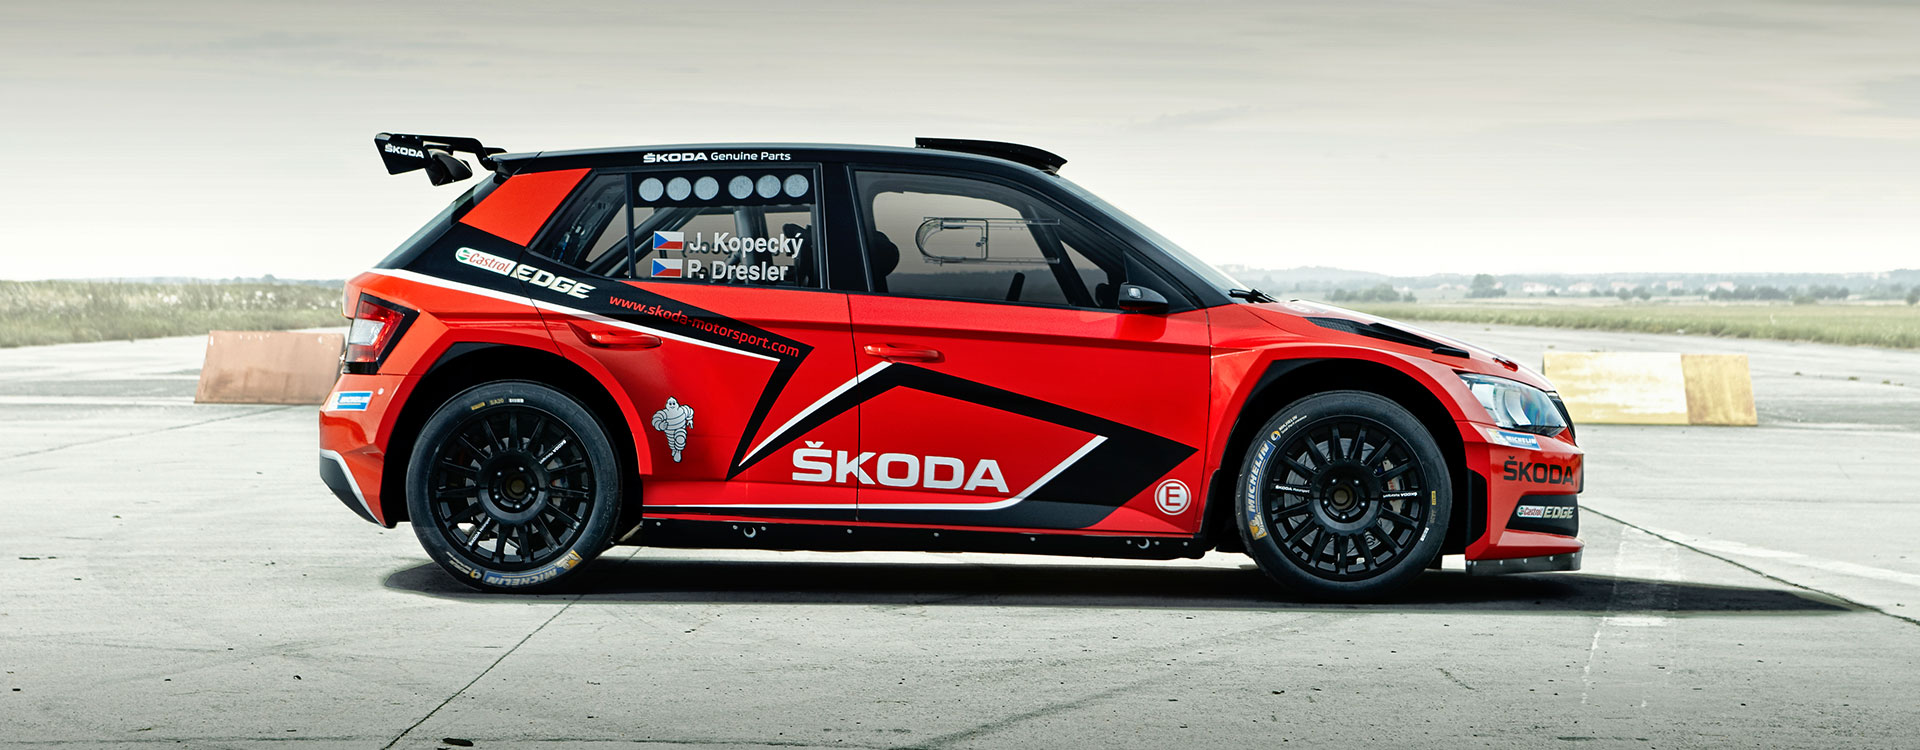 Barum Czech Rally Zlín 2016: ŠKODA looking forward to rally classic on home soil